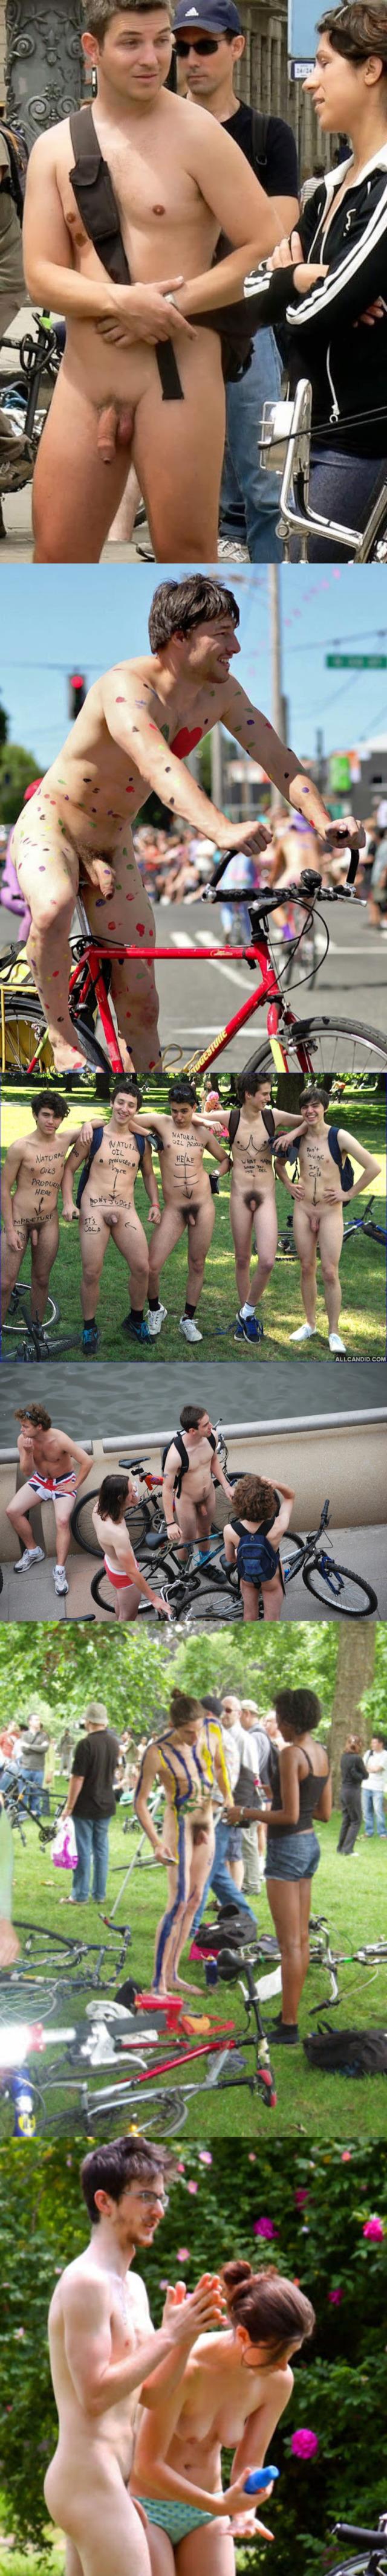 guys naked public wnbr